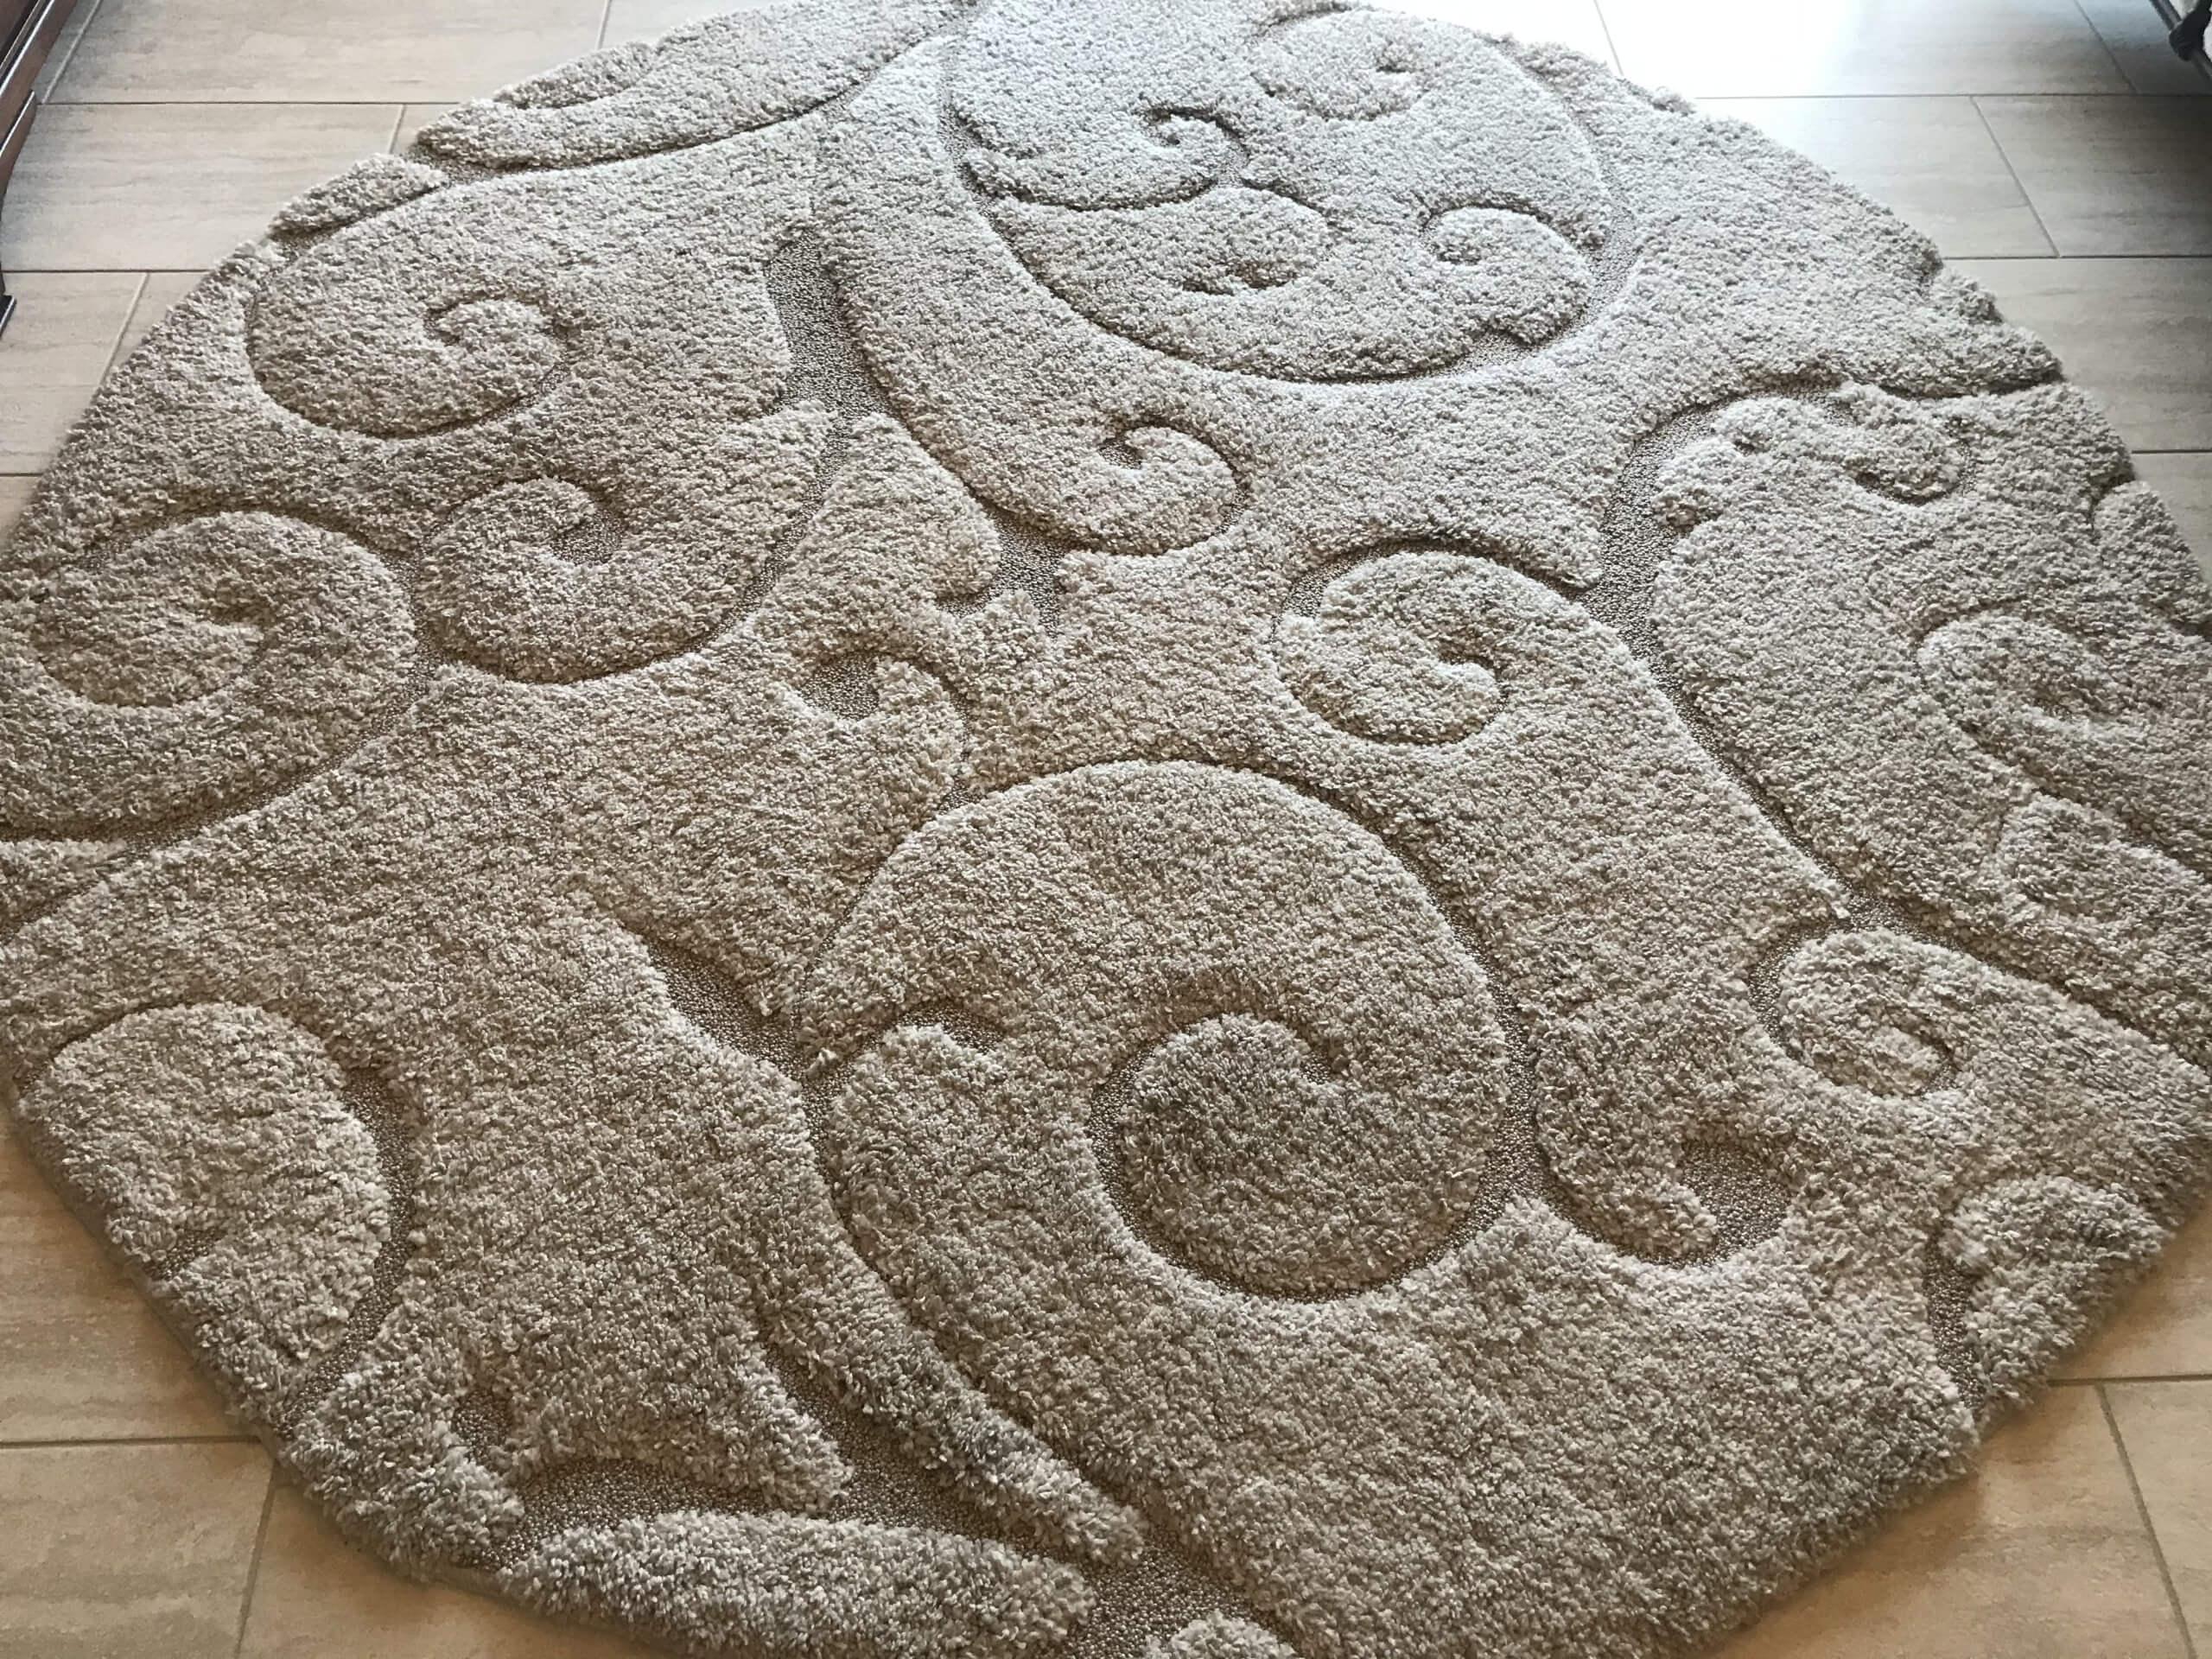 Round shag cream/beige area rug